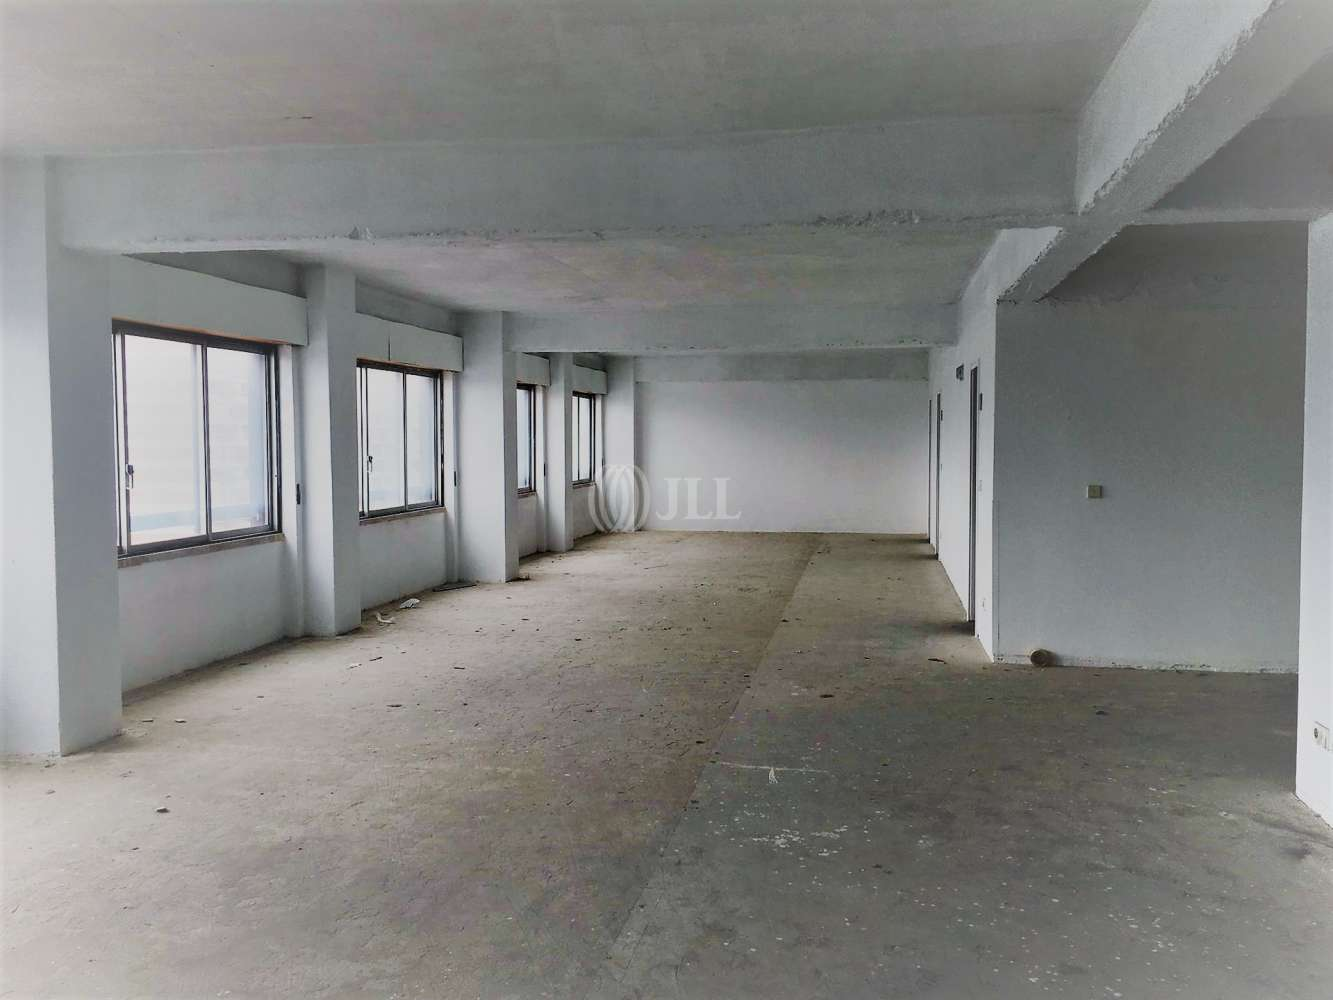 Escritórios Lisboa, 2685-220 - Edifício Concórdia